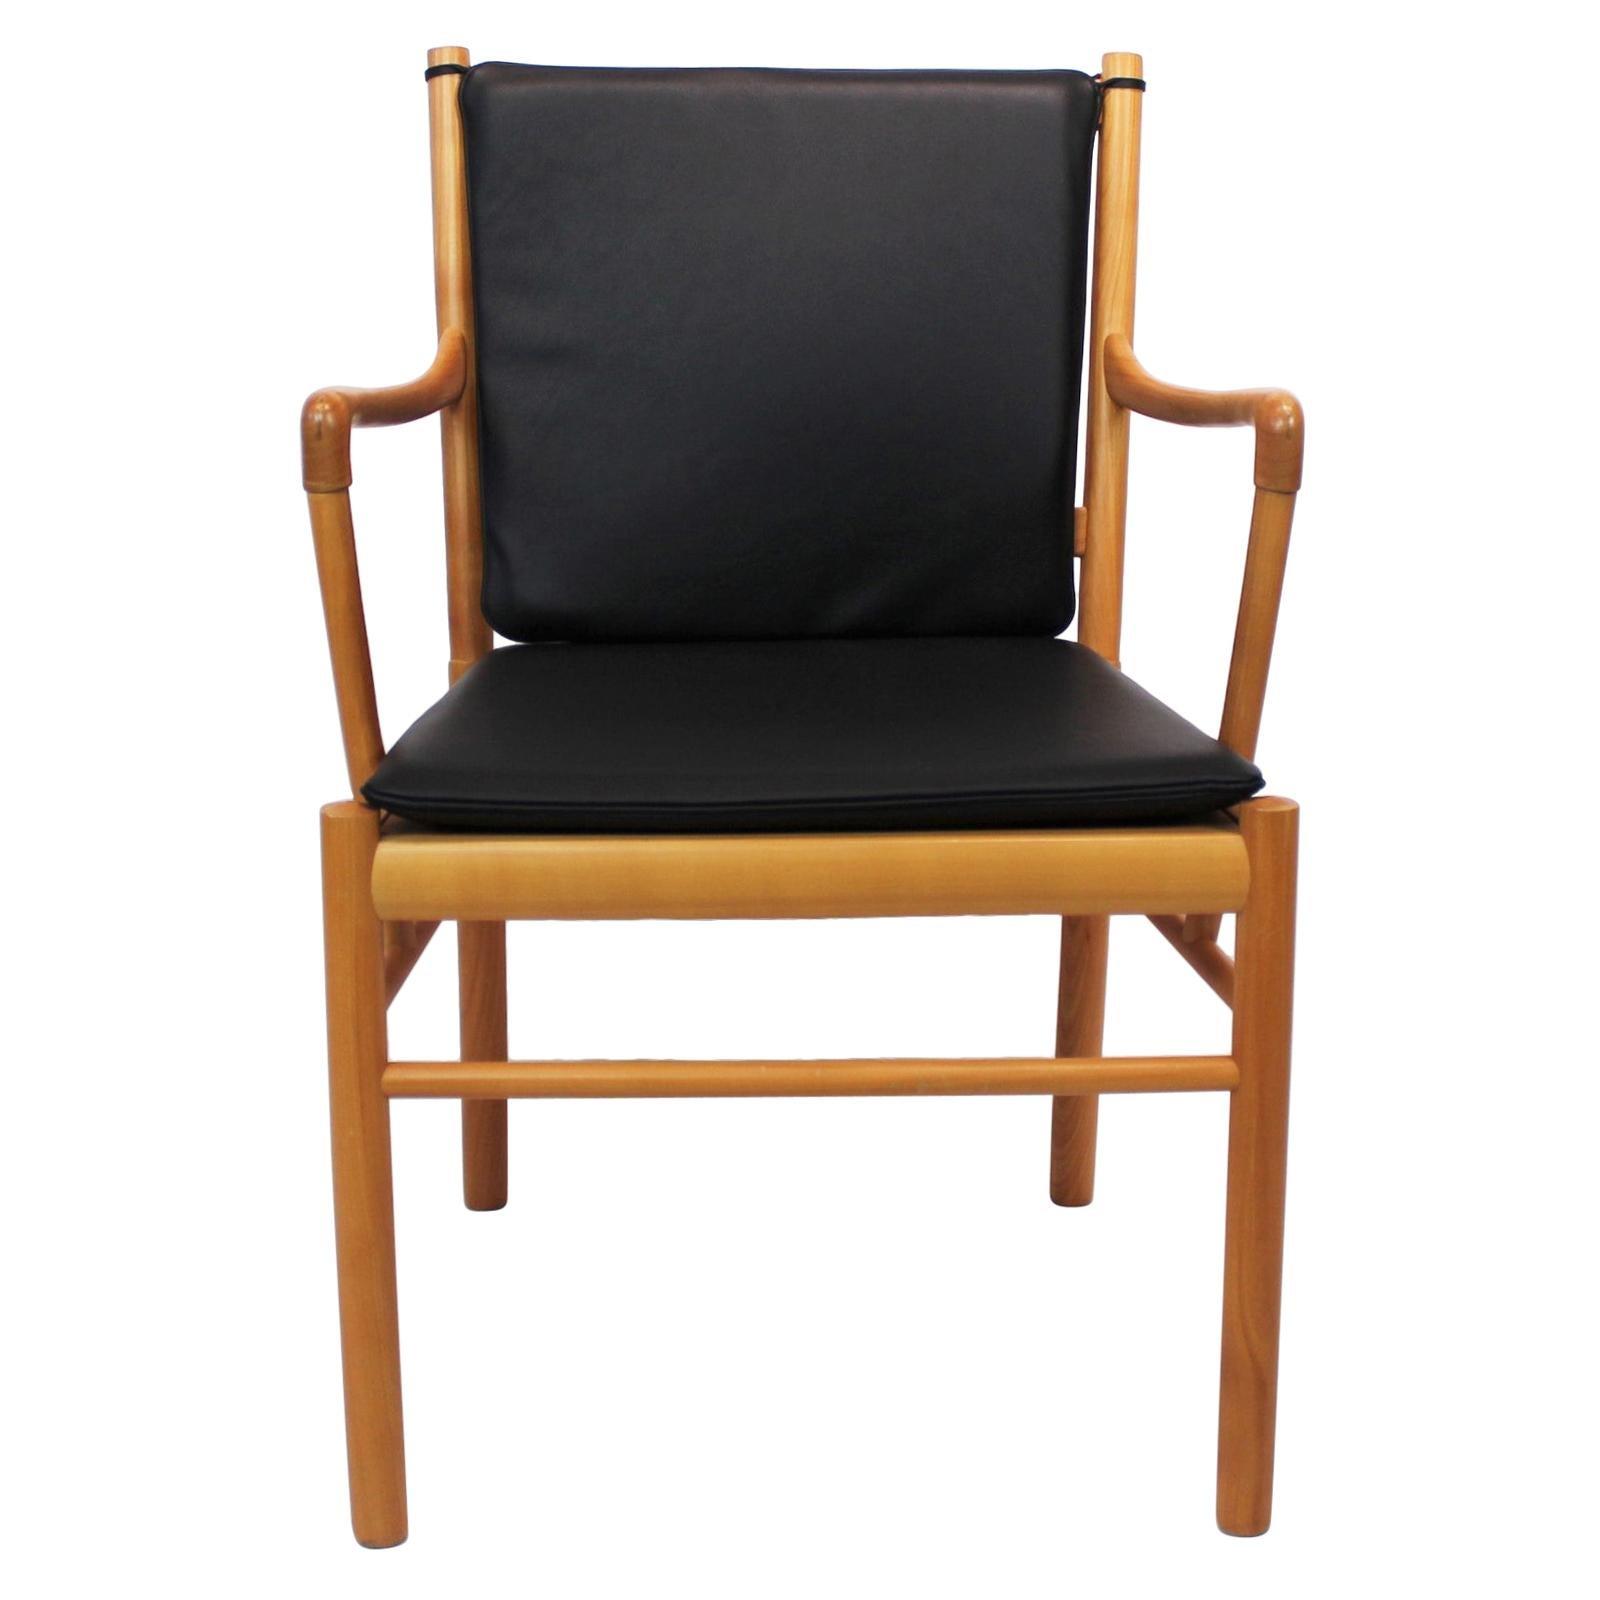 Armchair, Model PJ-301, of Cherry wood by Ole Wanscher